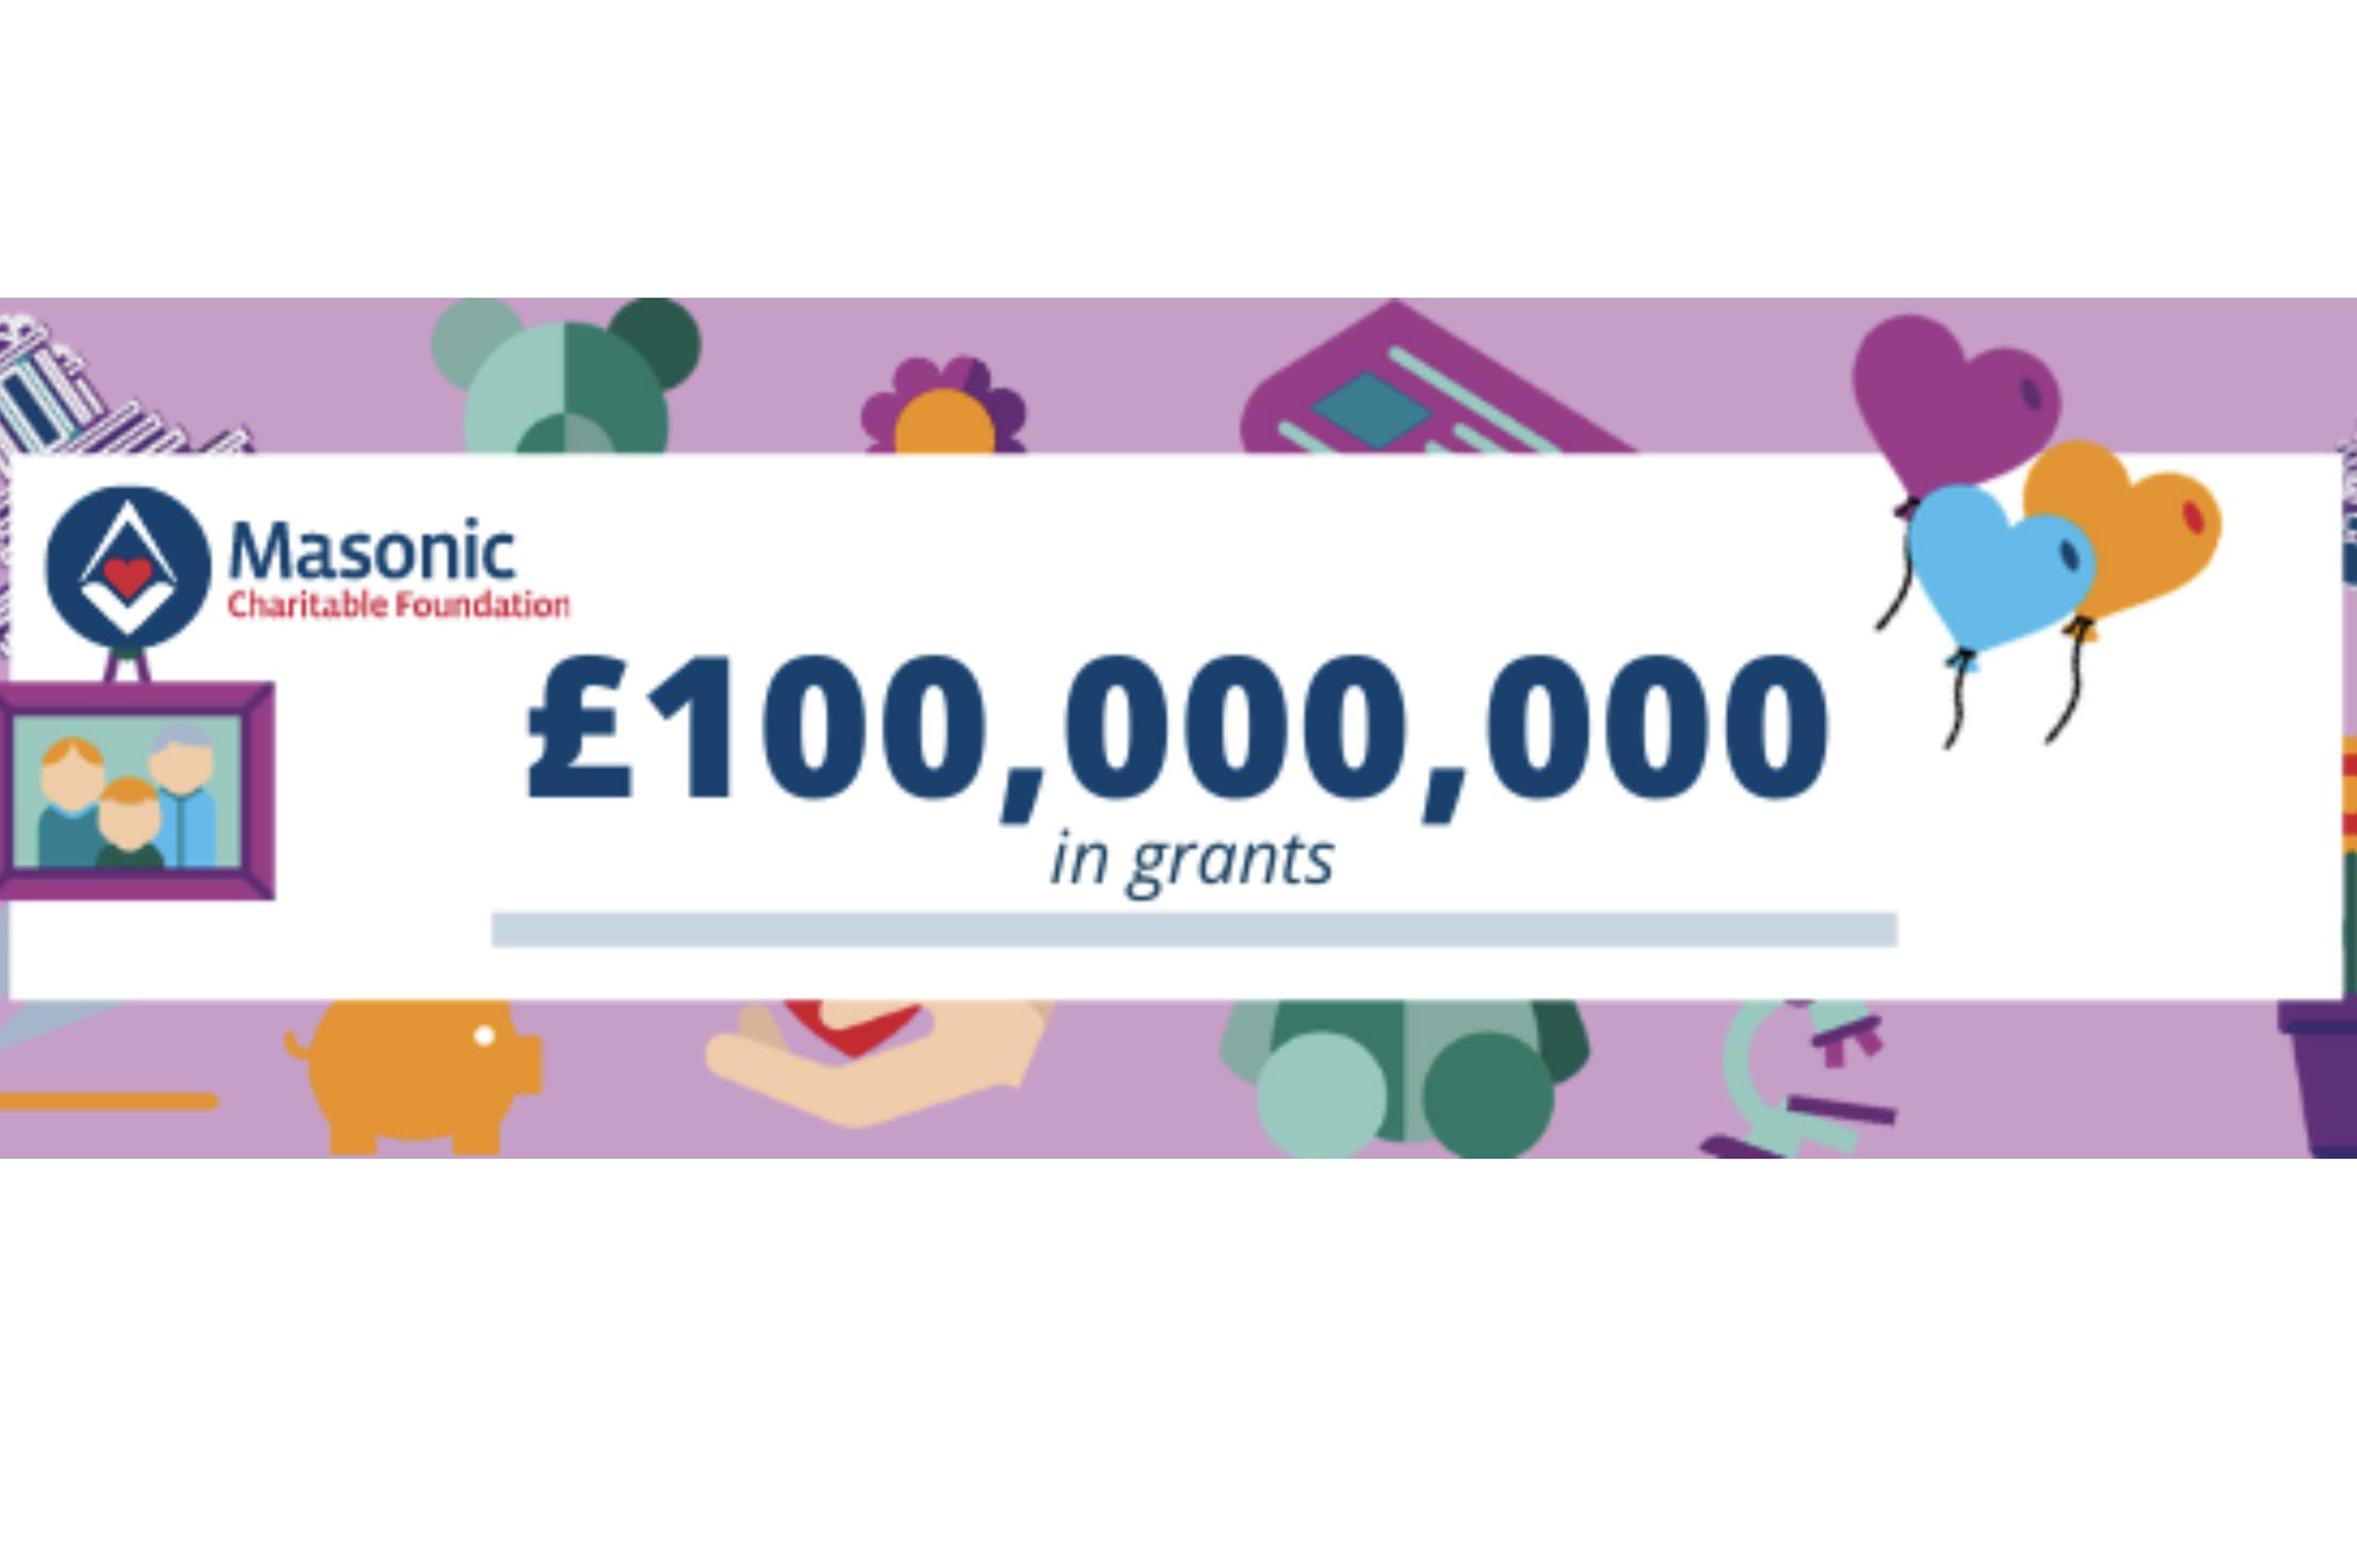 MCF Awards Top £100 Million